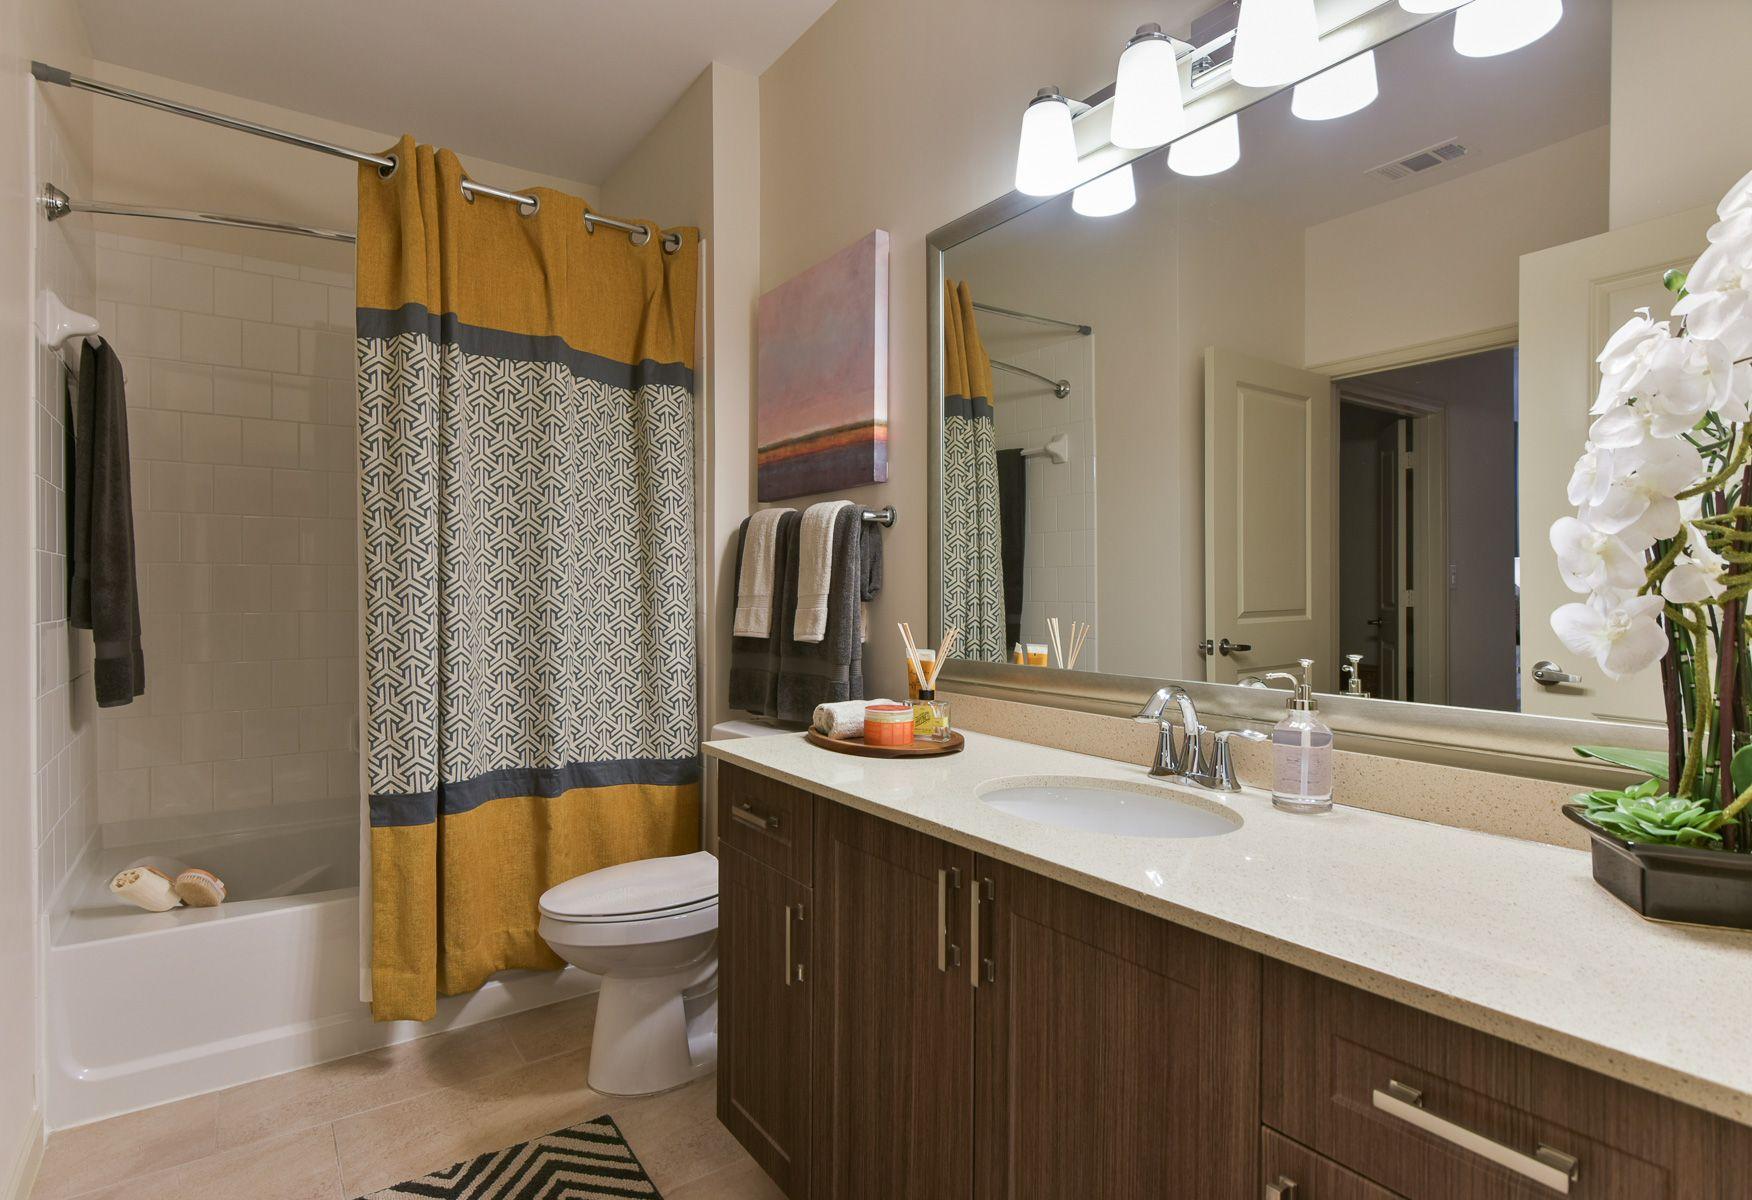 Encore Clairmont in bathroom with double vanity